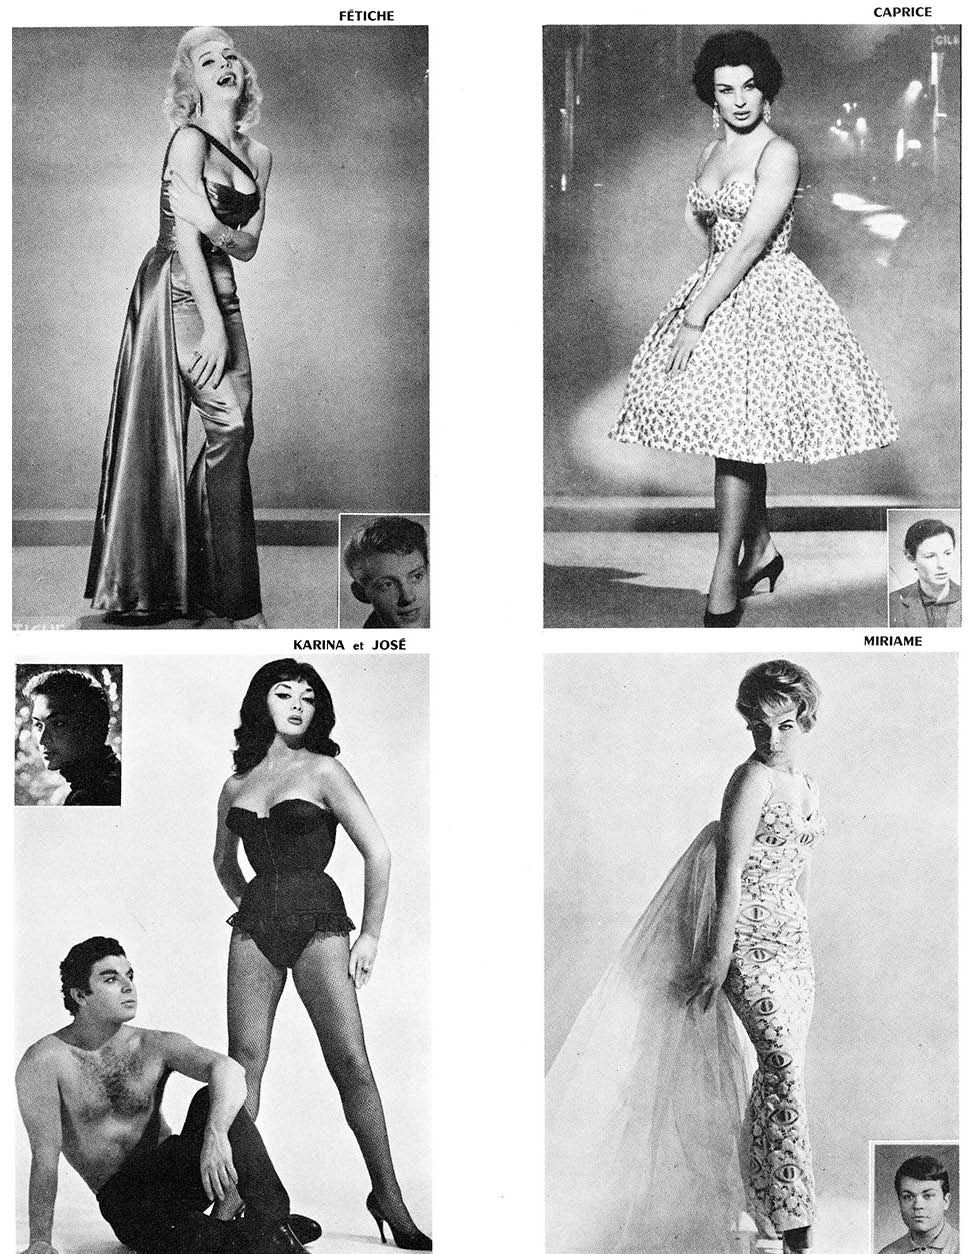 vintage transgender   Pin it 9 Like 1 Image